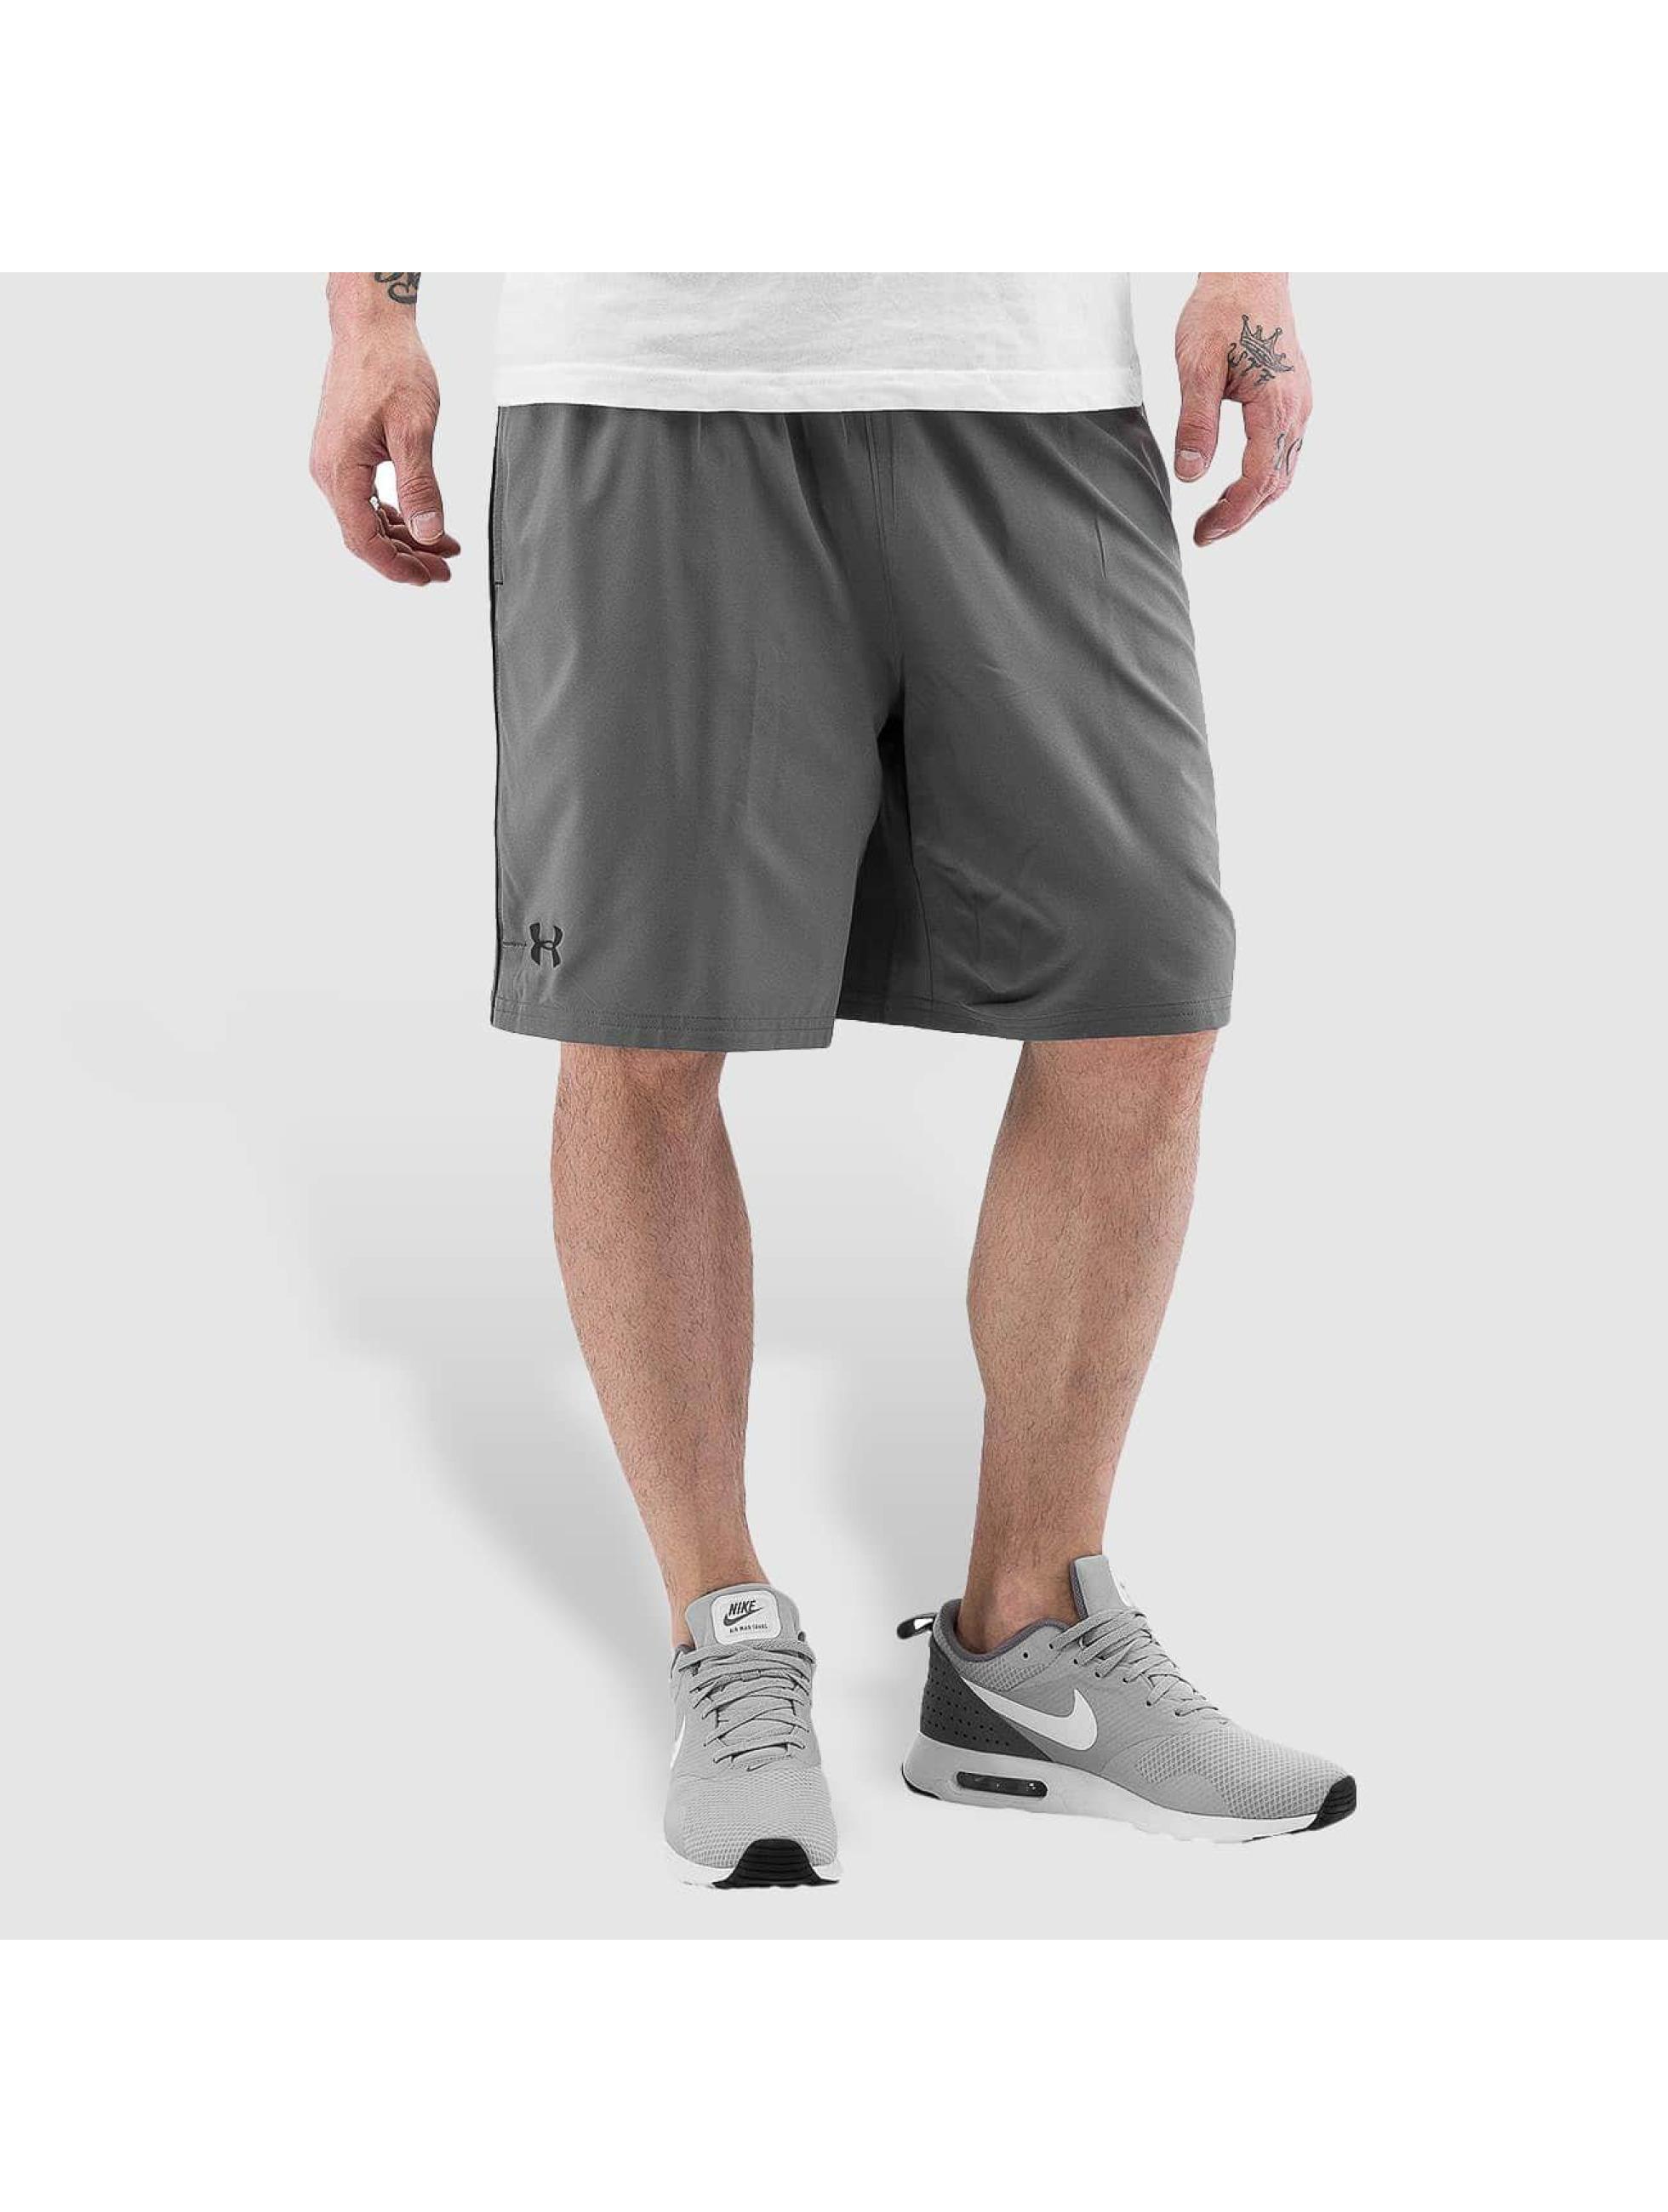 Under Armour shorts Mirage grijs